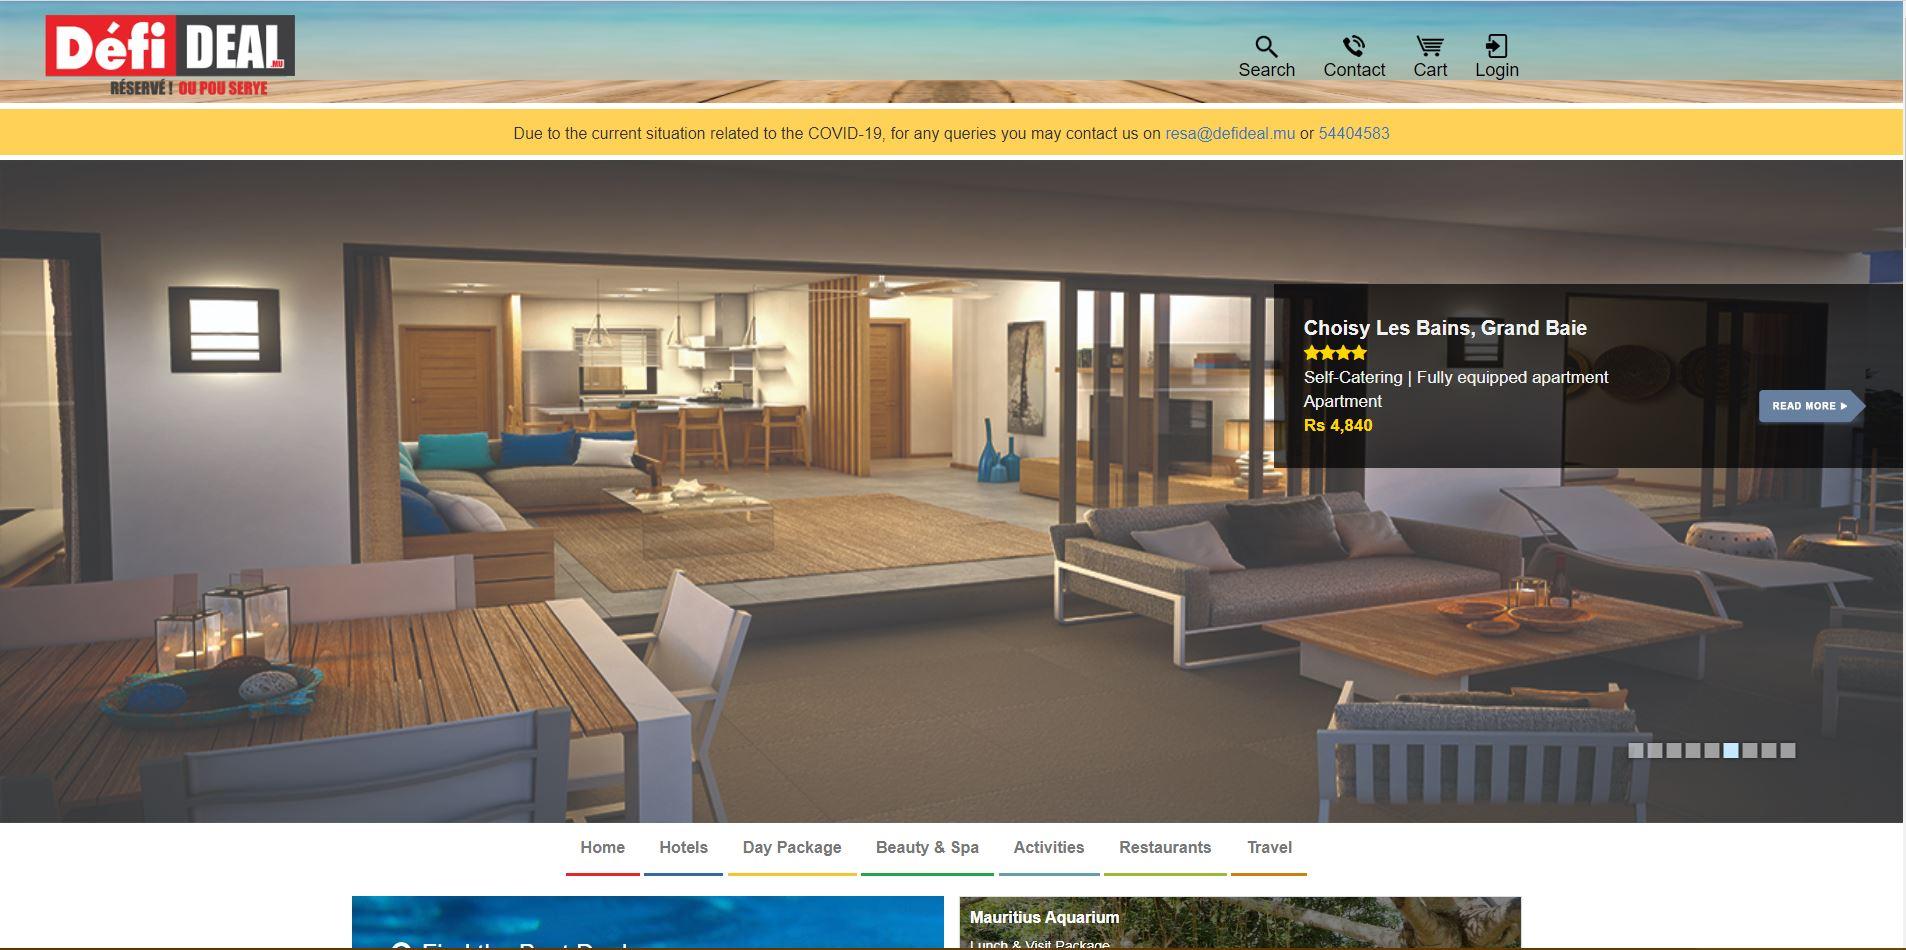 Defi-deal-Digital-Marketing-Mauritius-Ecommerce